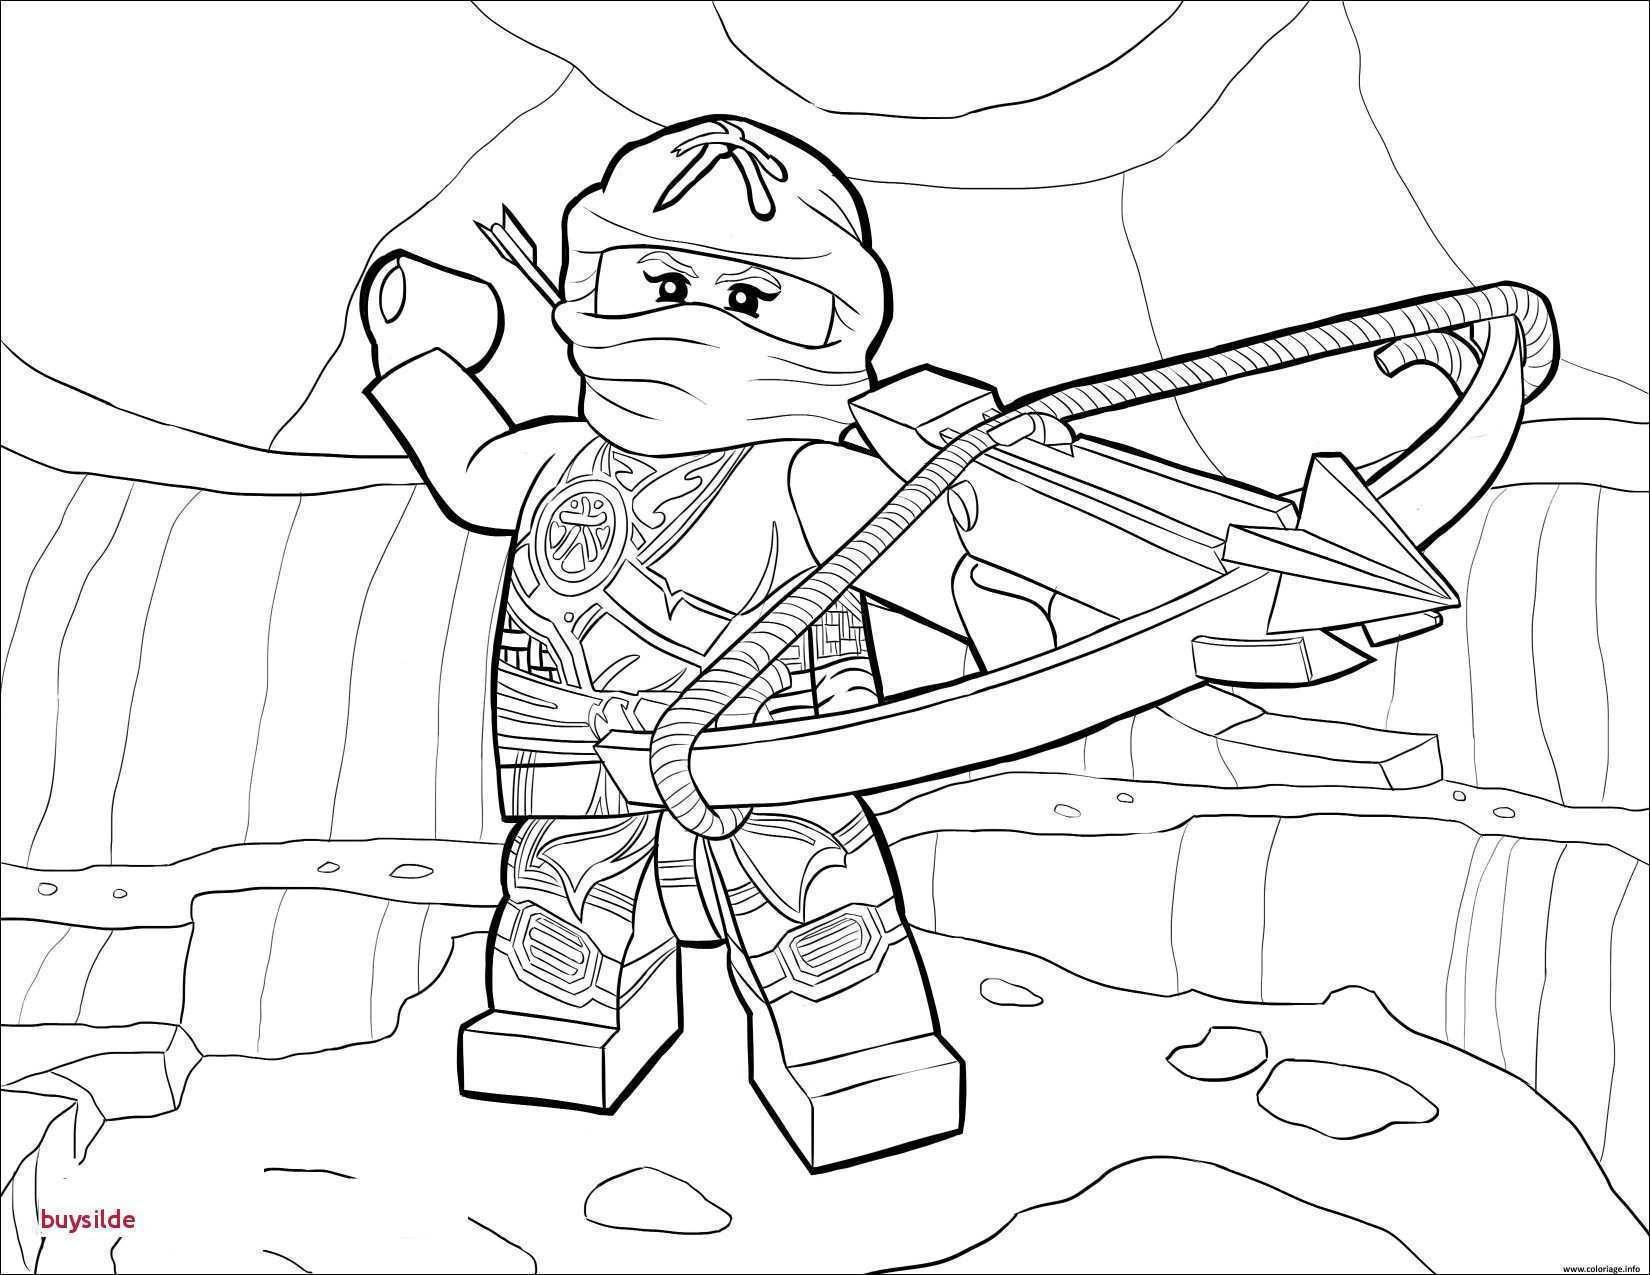 Ausmalbilder Ninja Turtles Neu Ausmalbild Ninja Turtles Bildnis Malvorlagen Igel Frisch Igel Sammlung